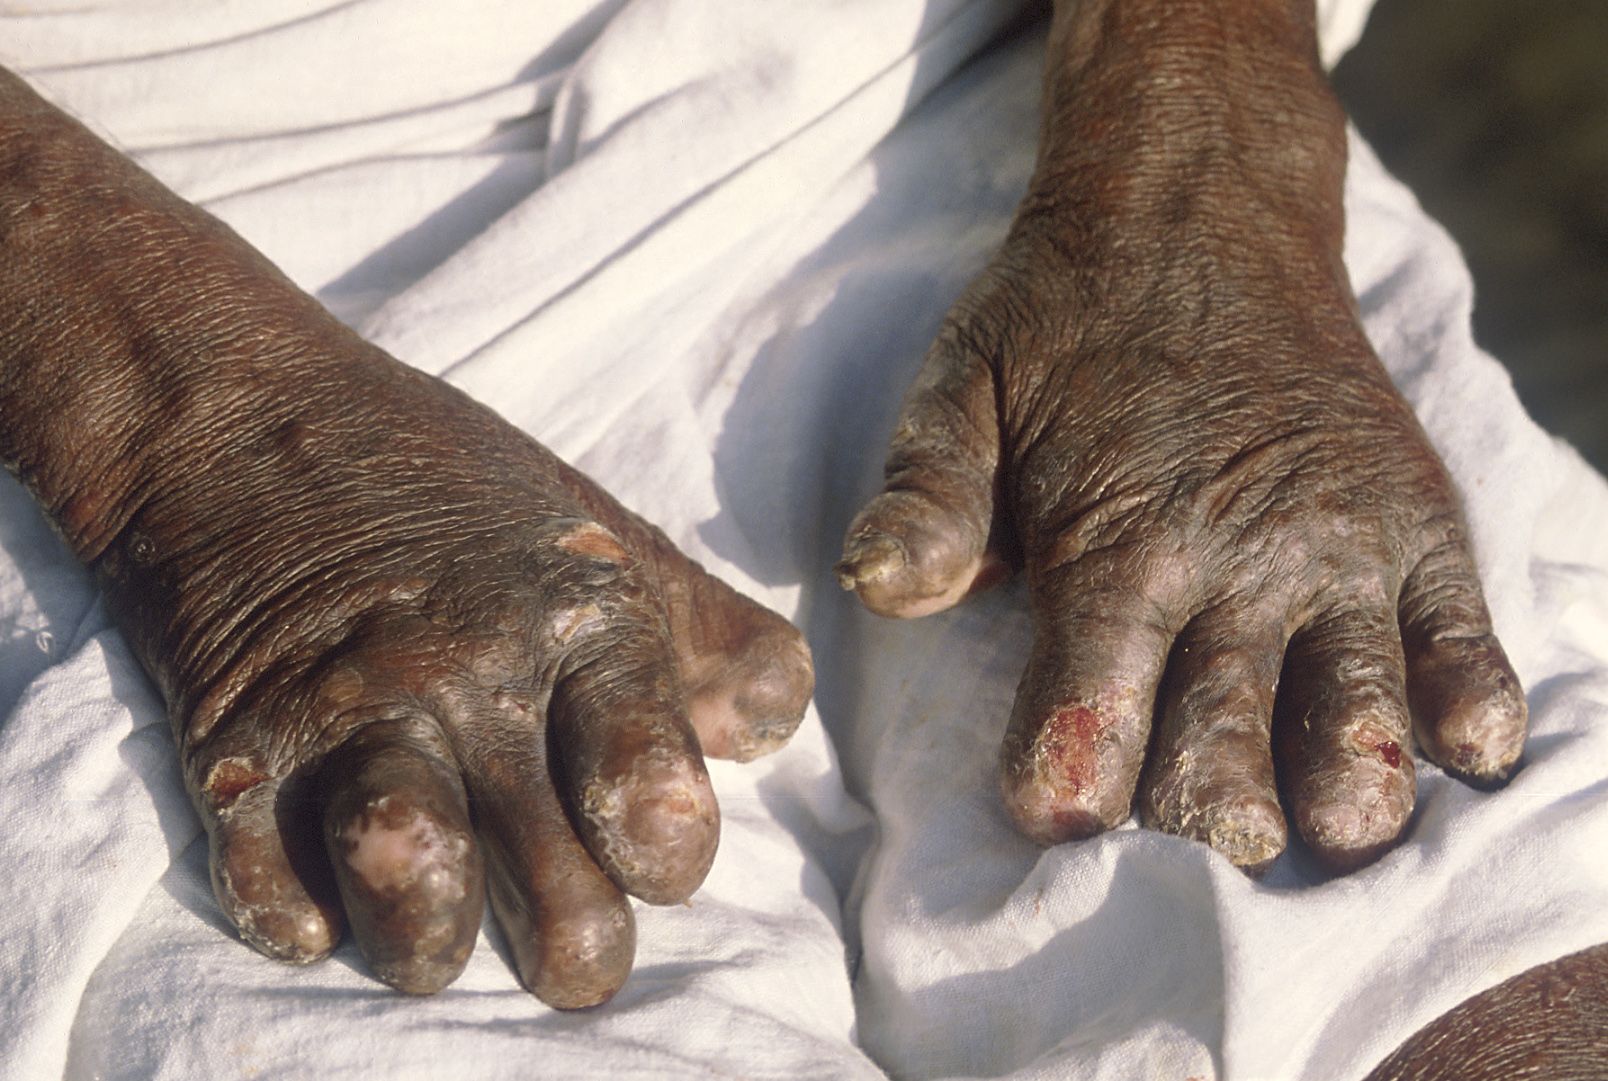 leprous hands